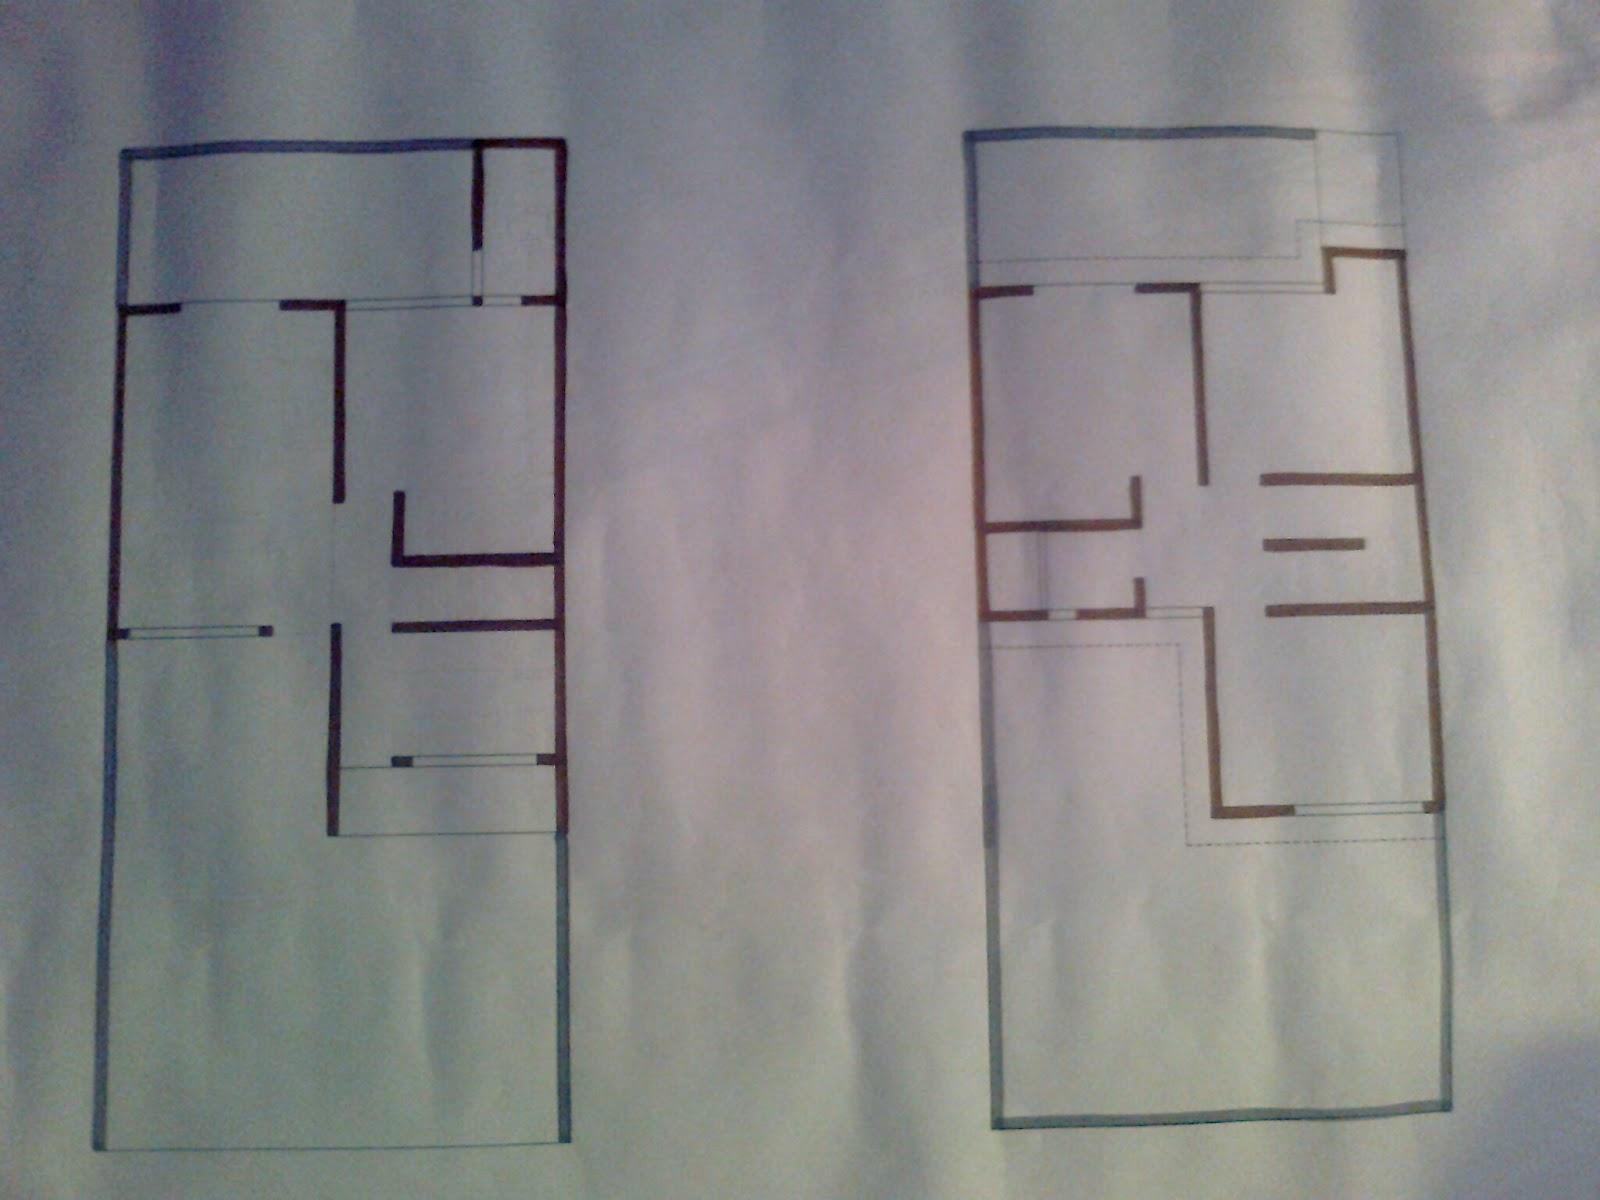 Santamar a miranda adriana jocelyn 5iv08 dibujo de for Simbologia de planos arquitectonicos